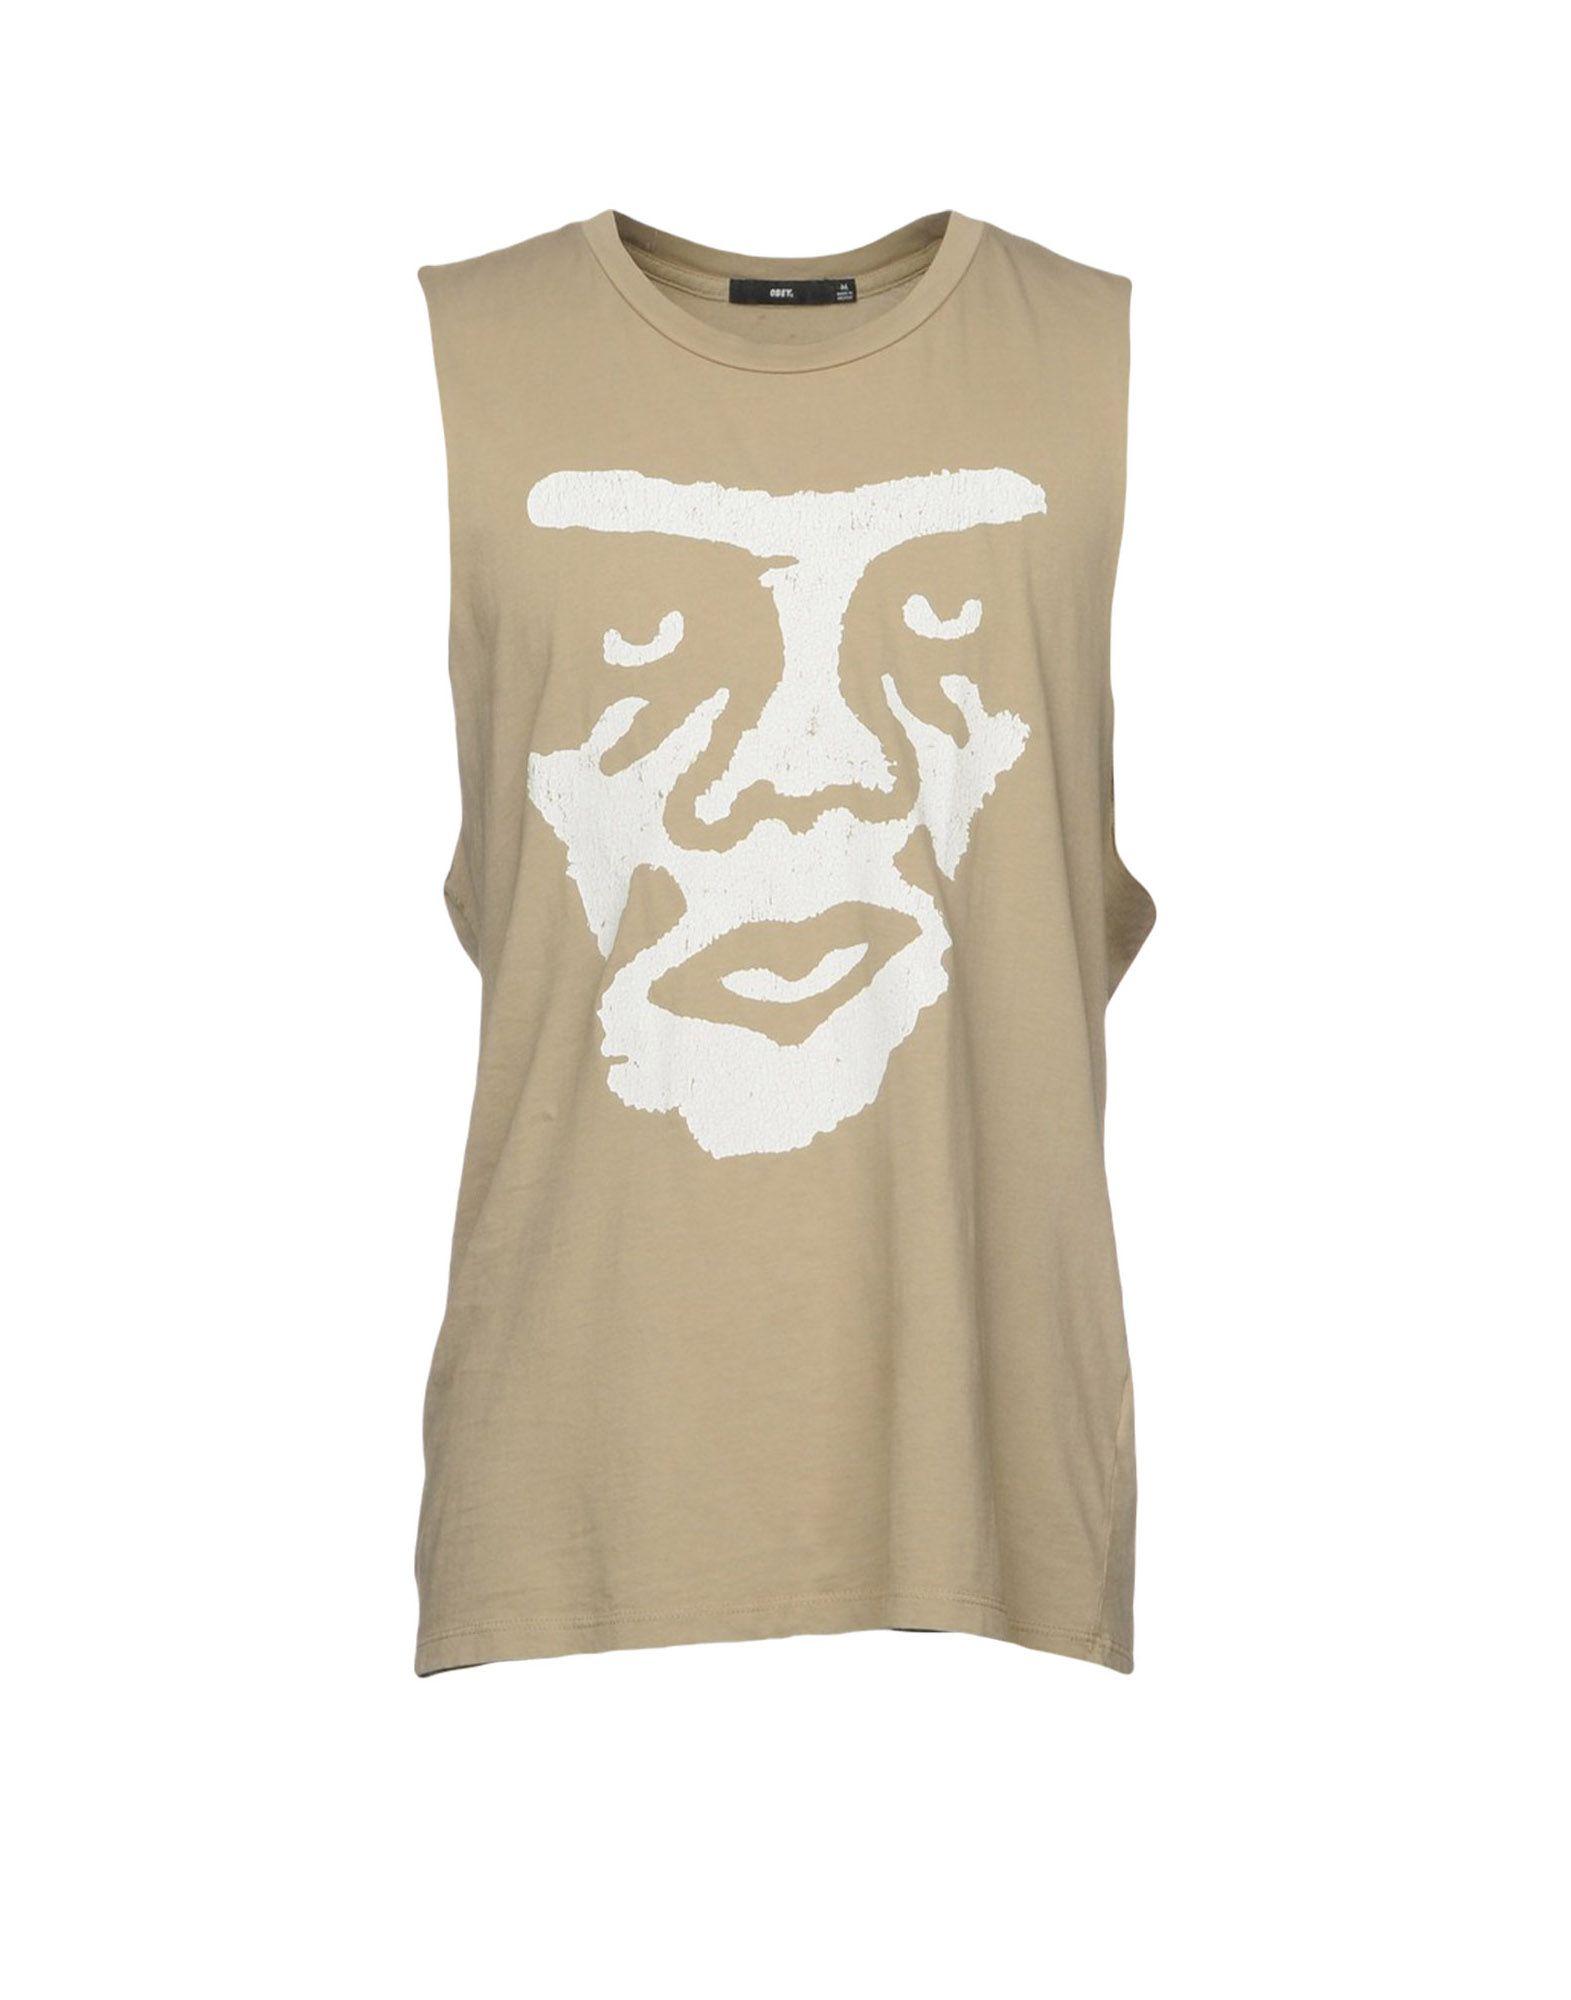 A Uomo buon mercato A buon mercato T-Shirt Obey Uomo A - 12085138PP 280e77